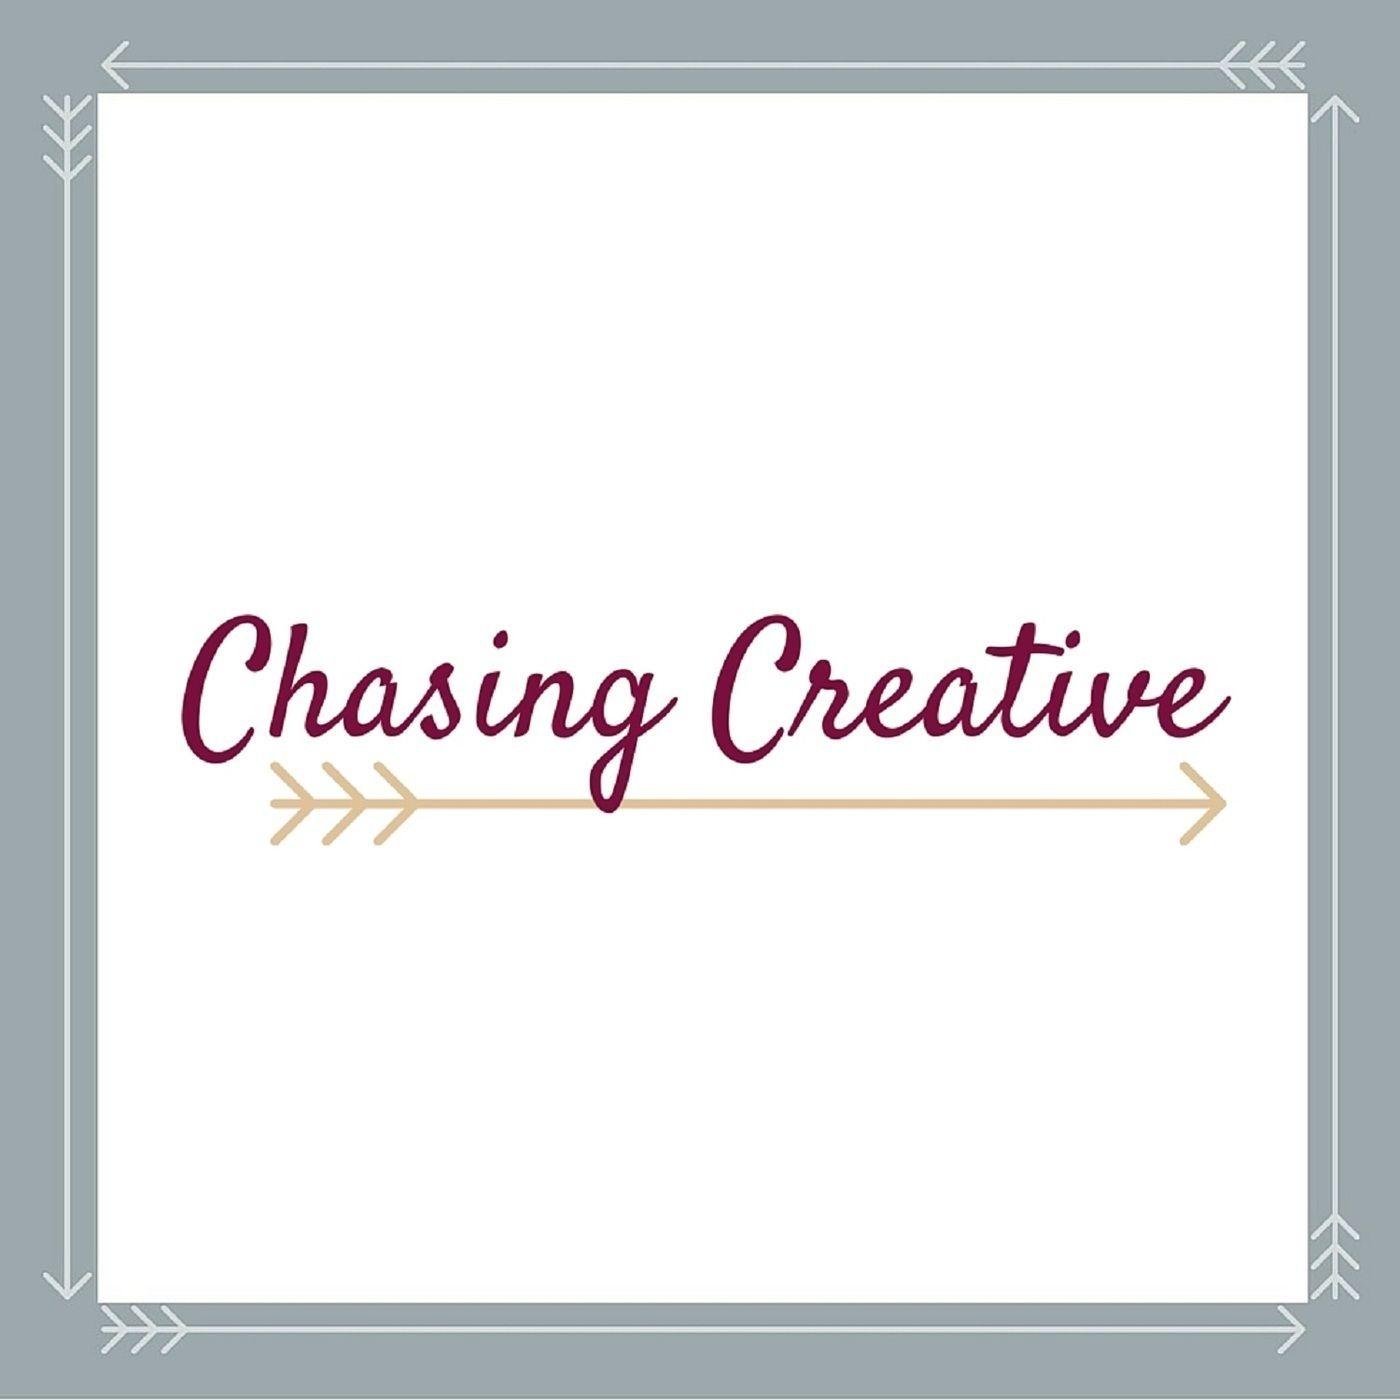 Chasing Creative